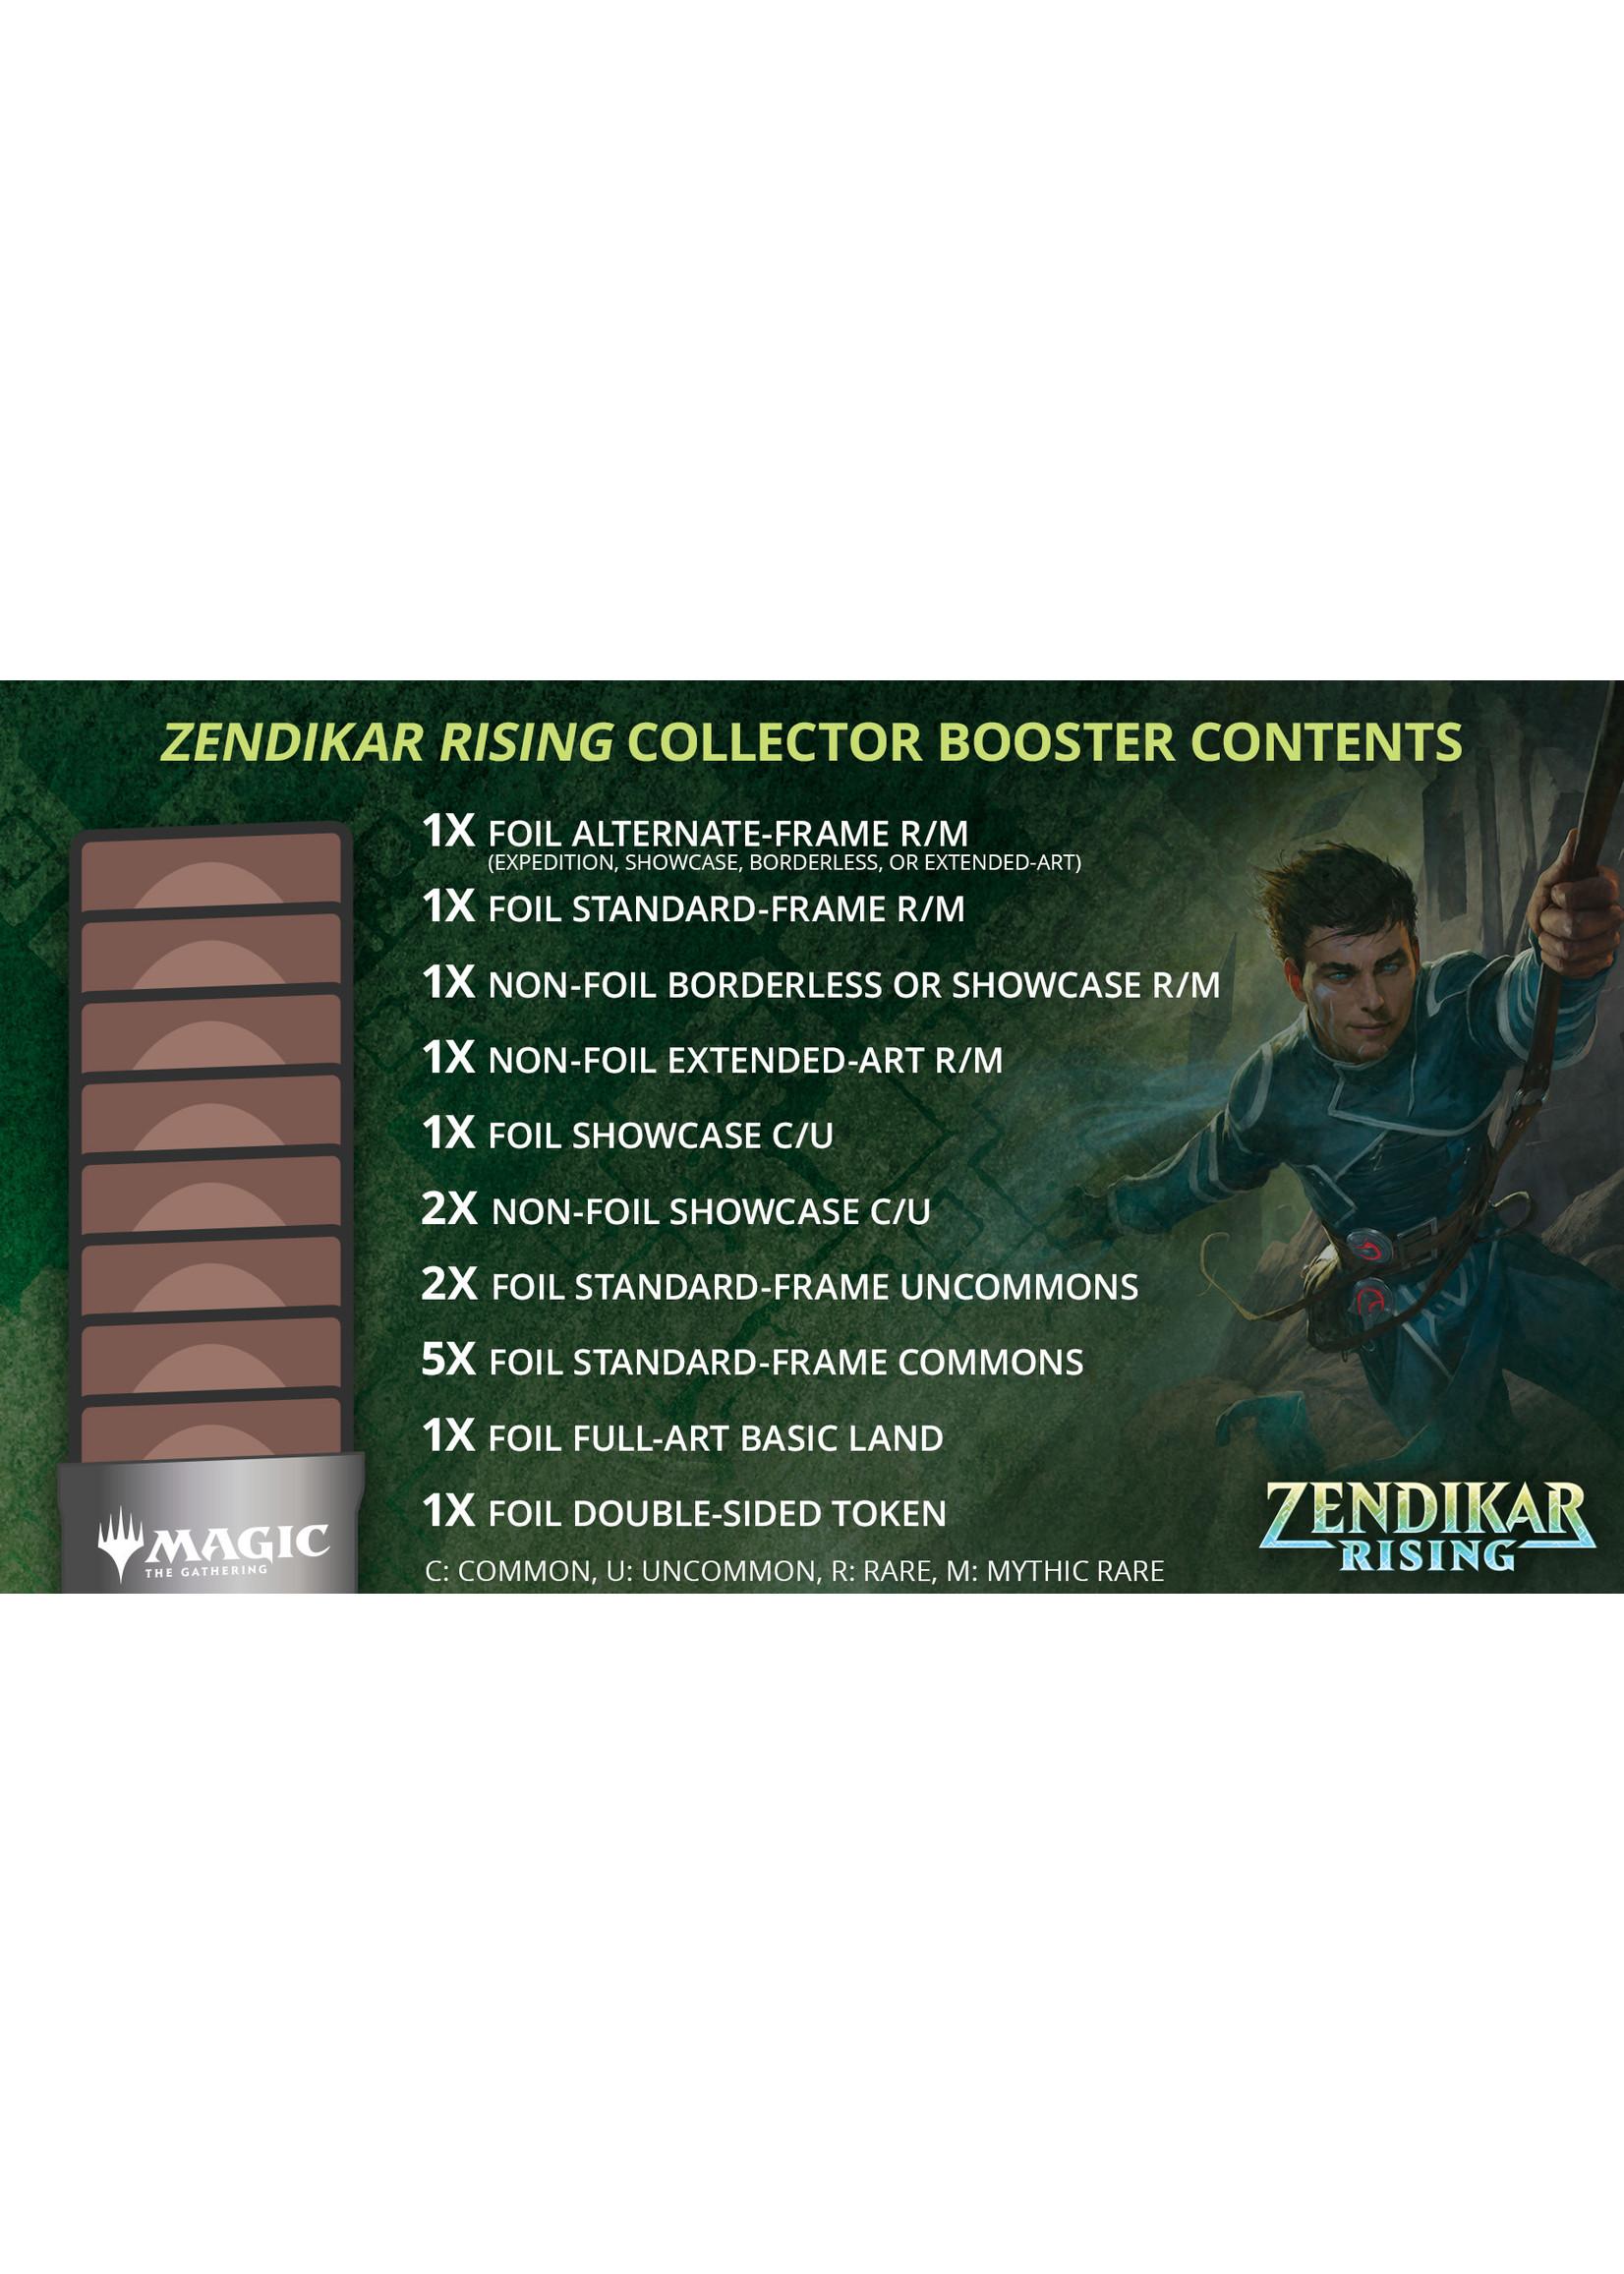 Magic: The Gathering Zendikar Rising Collector Collector Booster Box